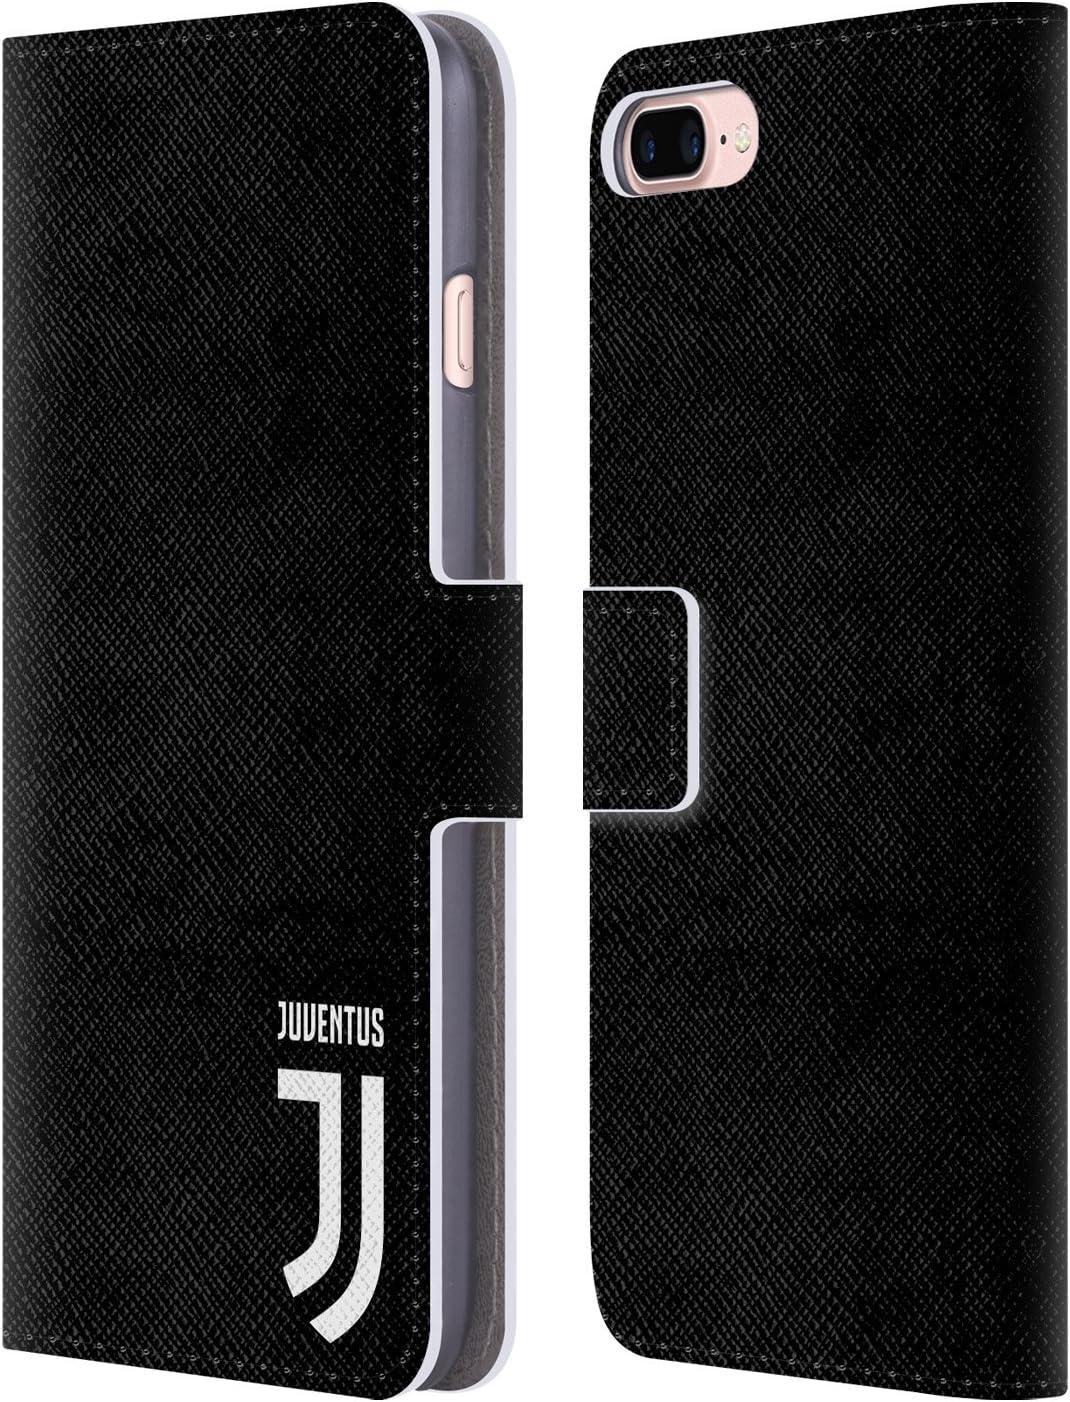 cover juve iphone 7 plus